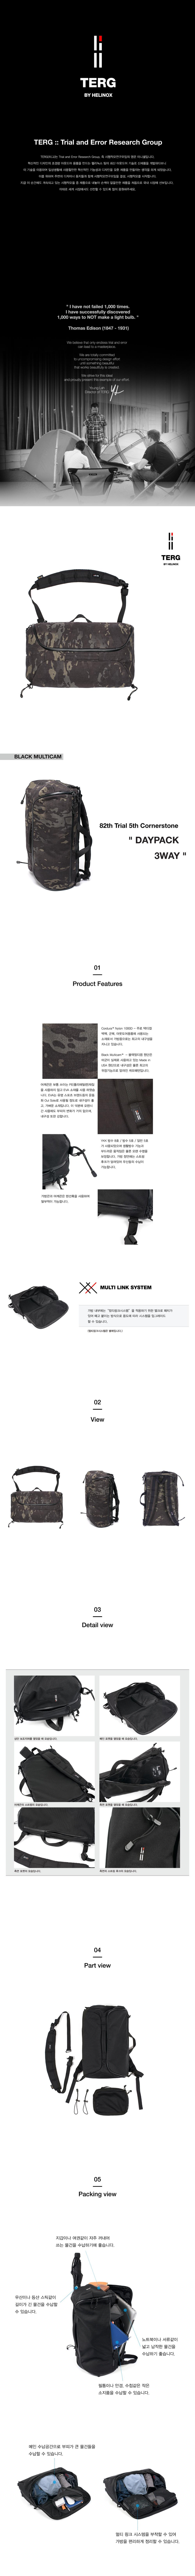 20170601-daypack-3way---black-multicam-상세페이지.png